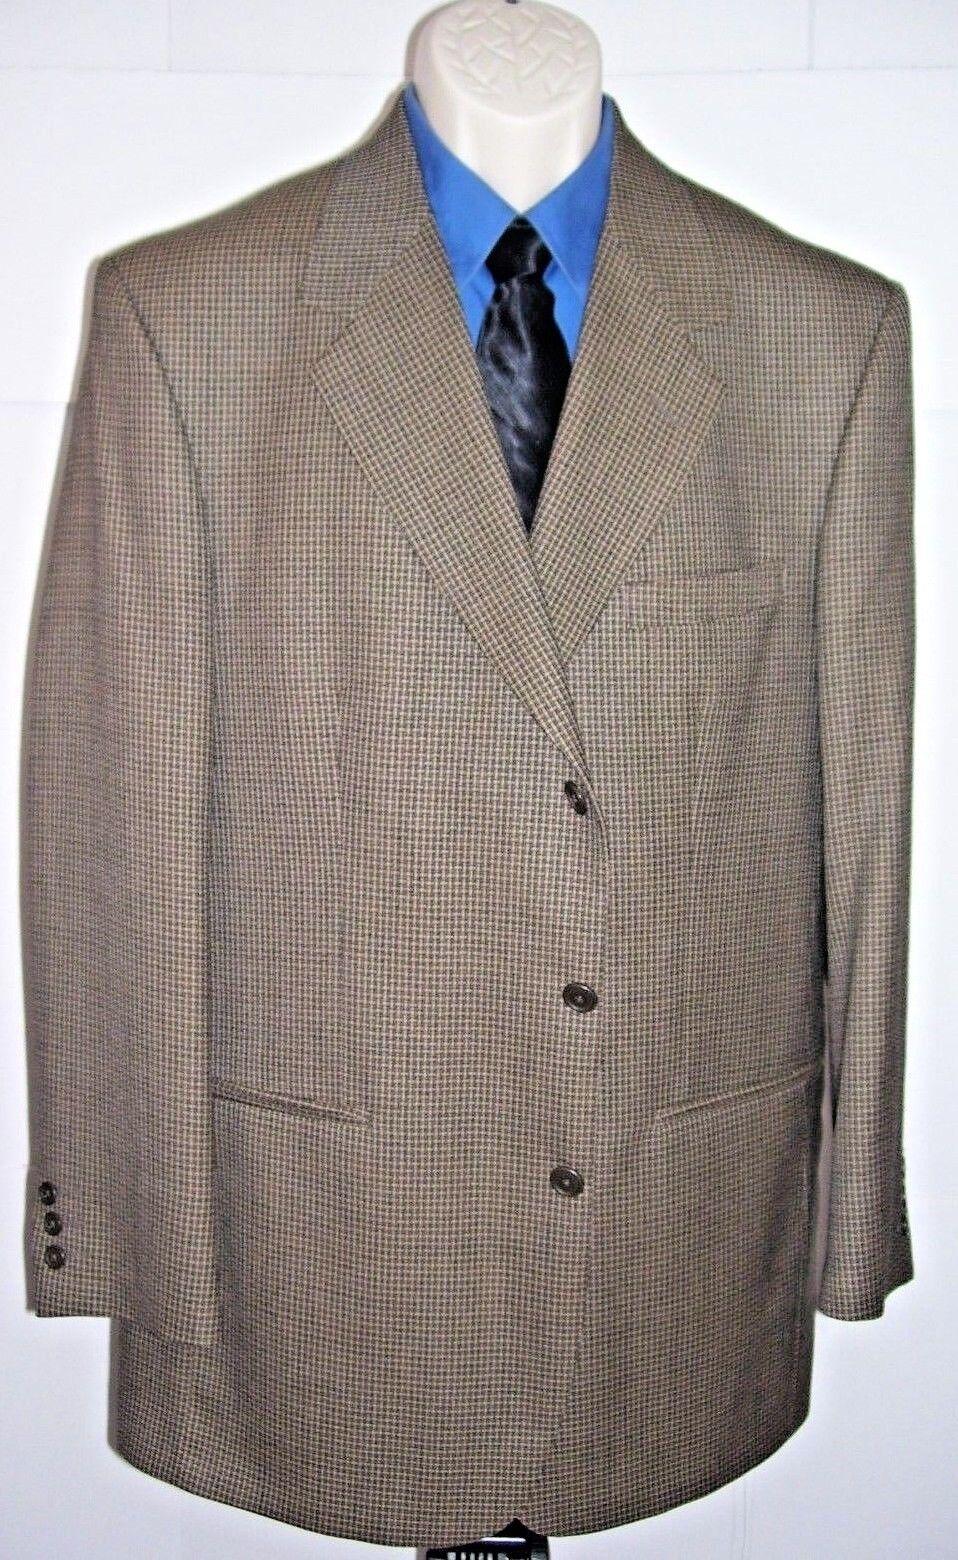 Henry Grethel Signature Collection  Herren Blazer Größe 42 Long 100% Worsted Wool